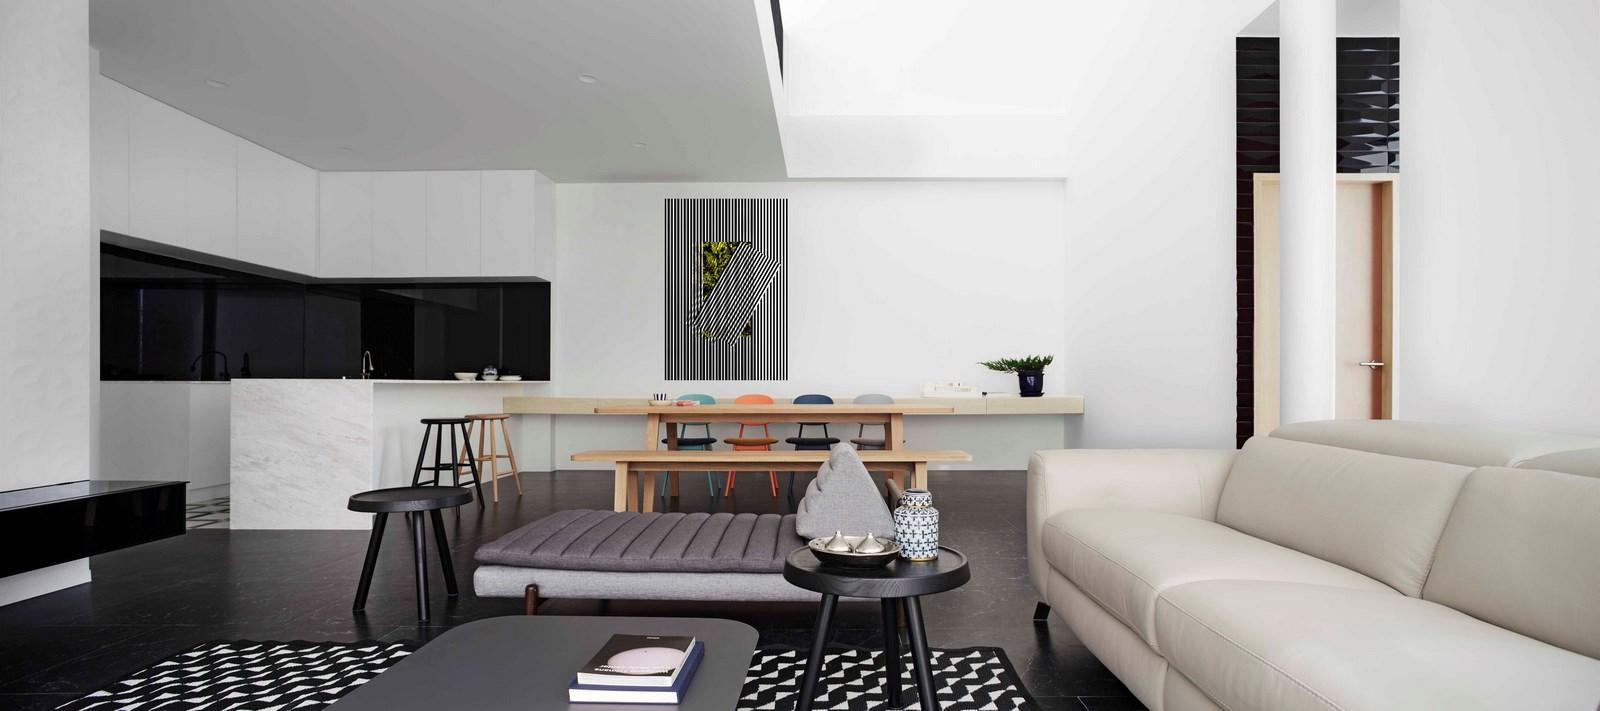 INT_Living area 01 (Copy)